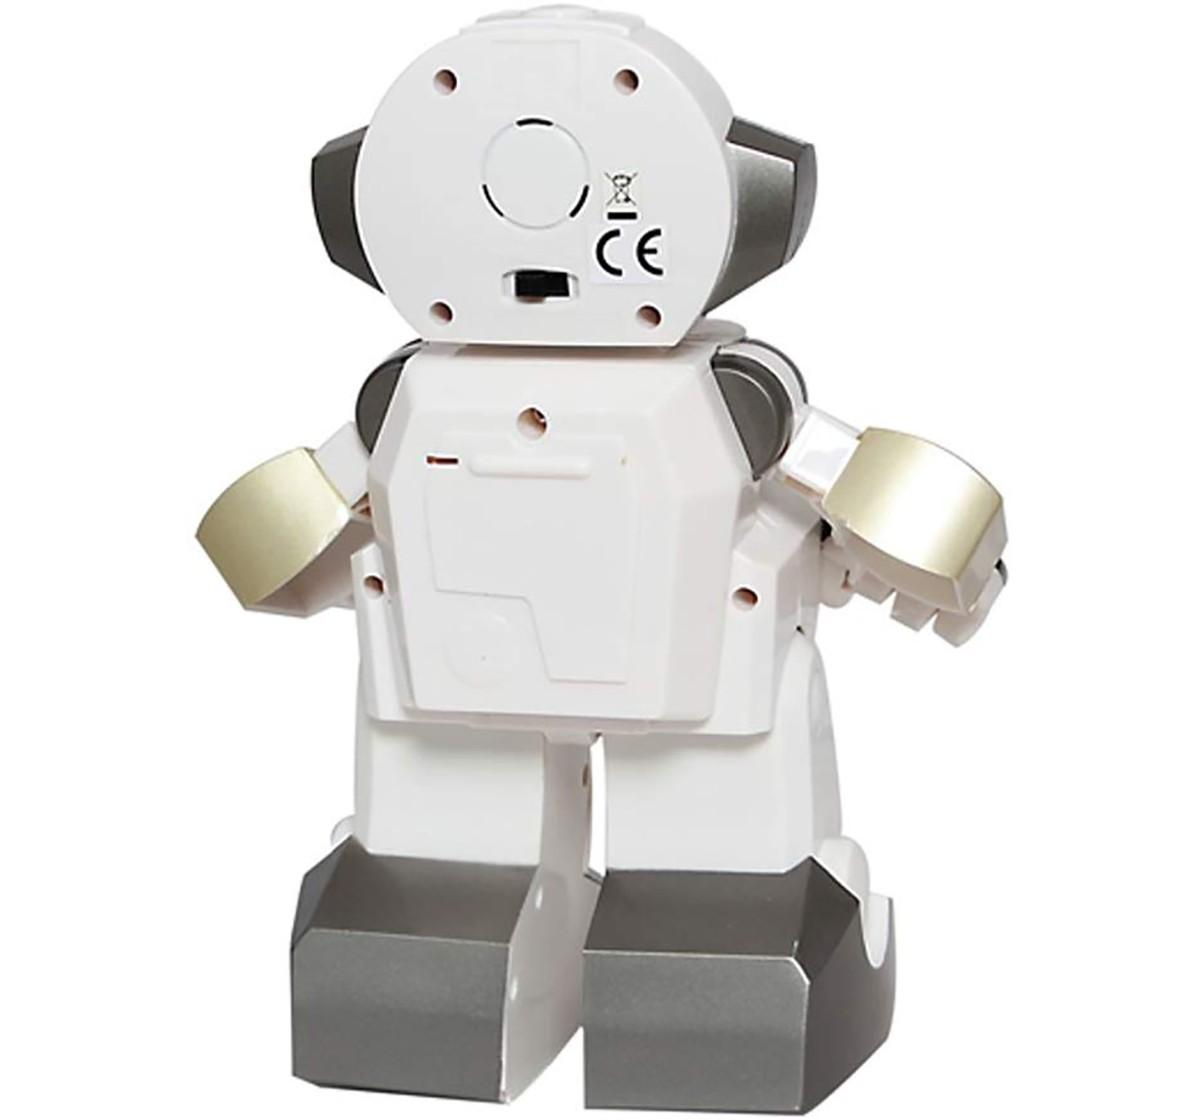 Silverlit Echobot - White Robotics for Kids age 5Y+ (White)